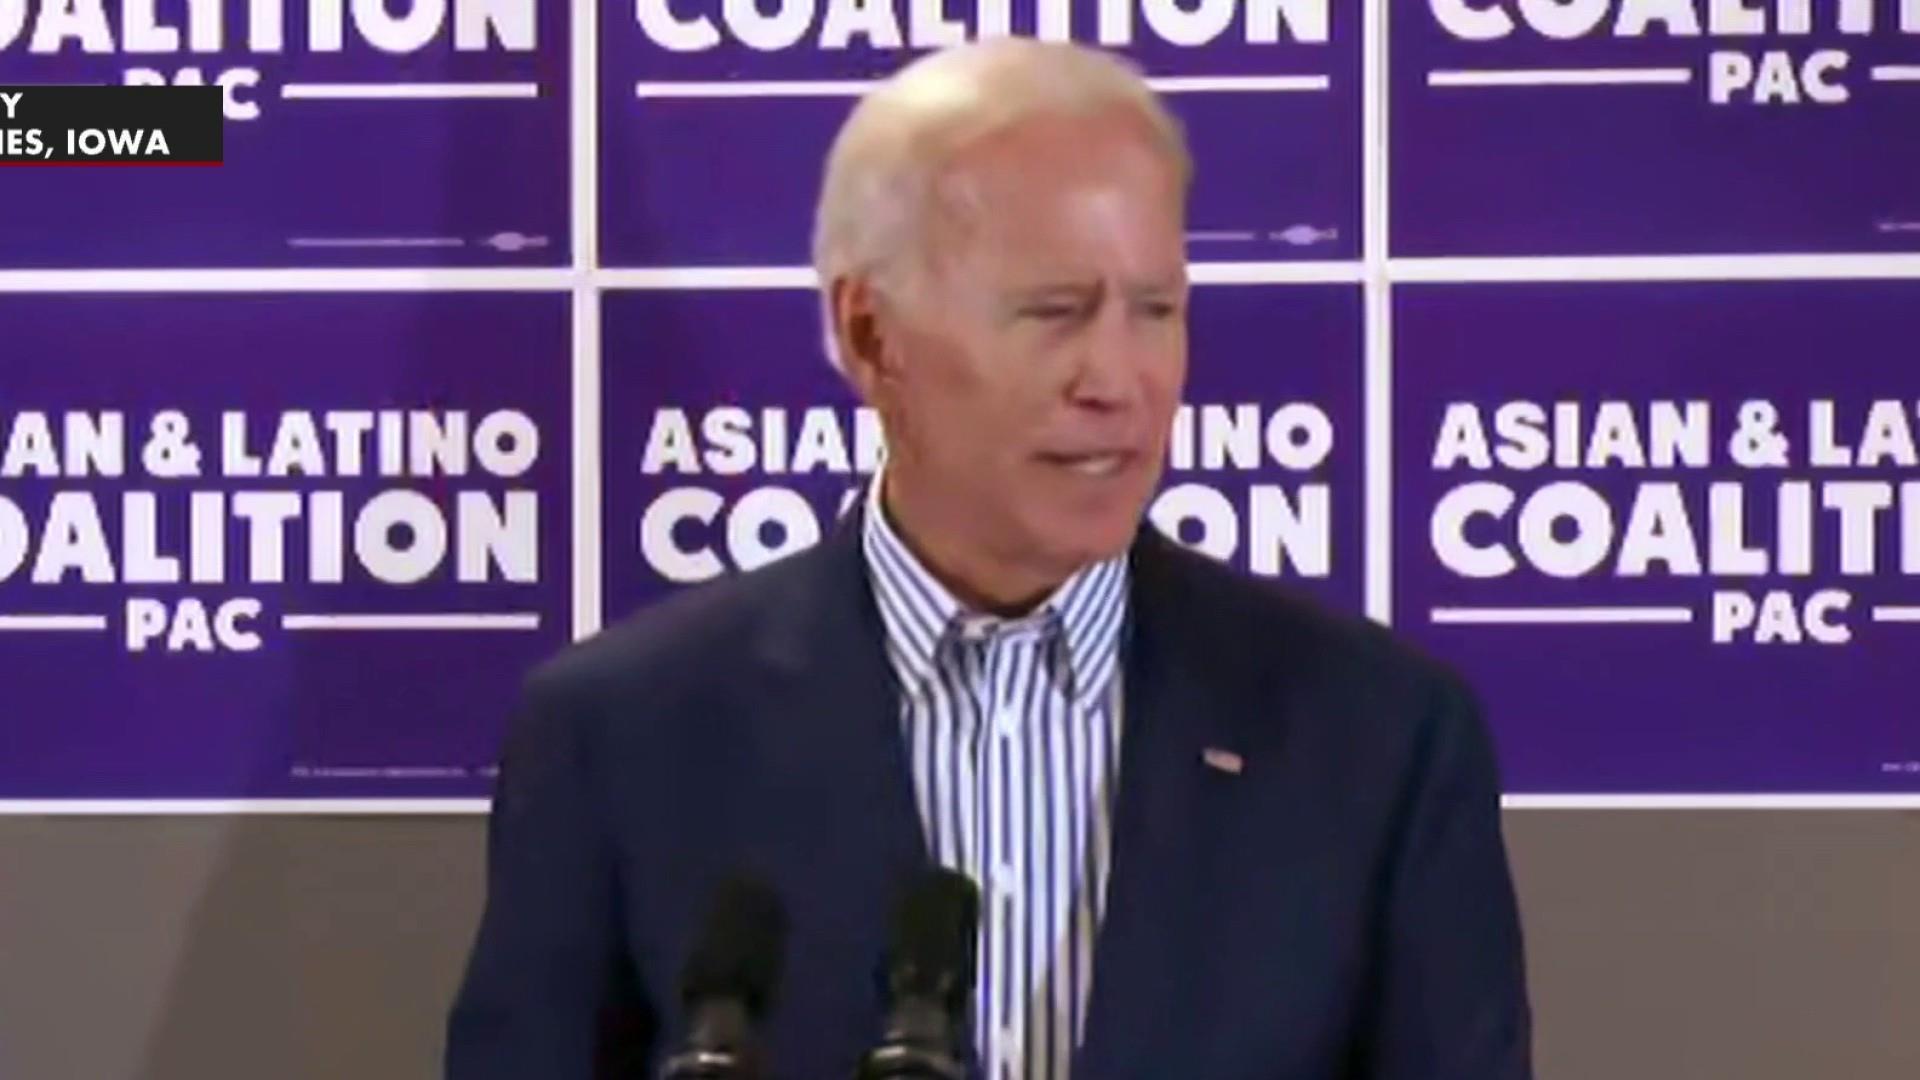 Putting Biden's gaffes into Trumpian perspective